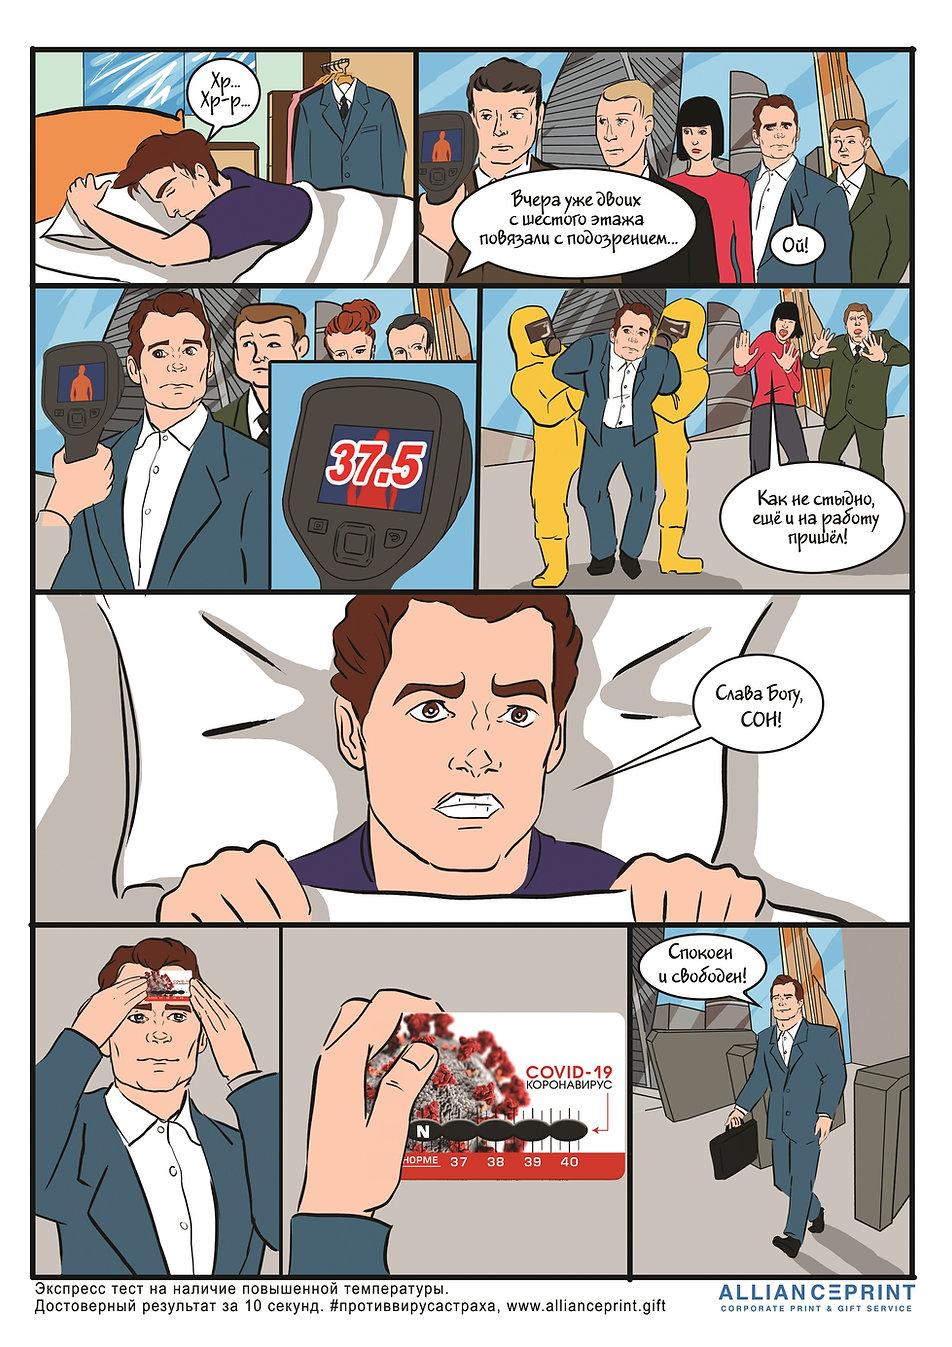 Комикс для рекламы температурного теста для Covid-19. Сделан на заказ в студии комиксов Vaes Okshn.